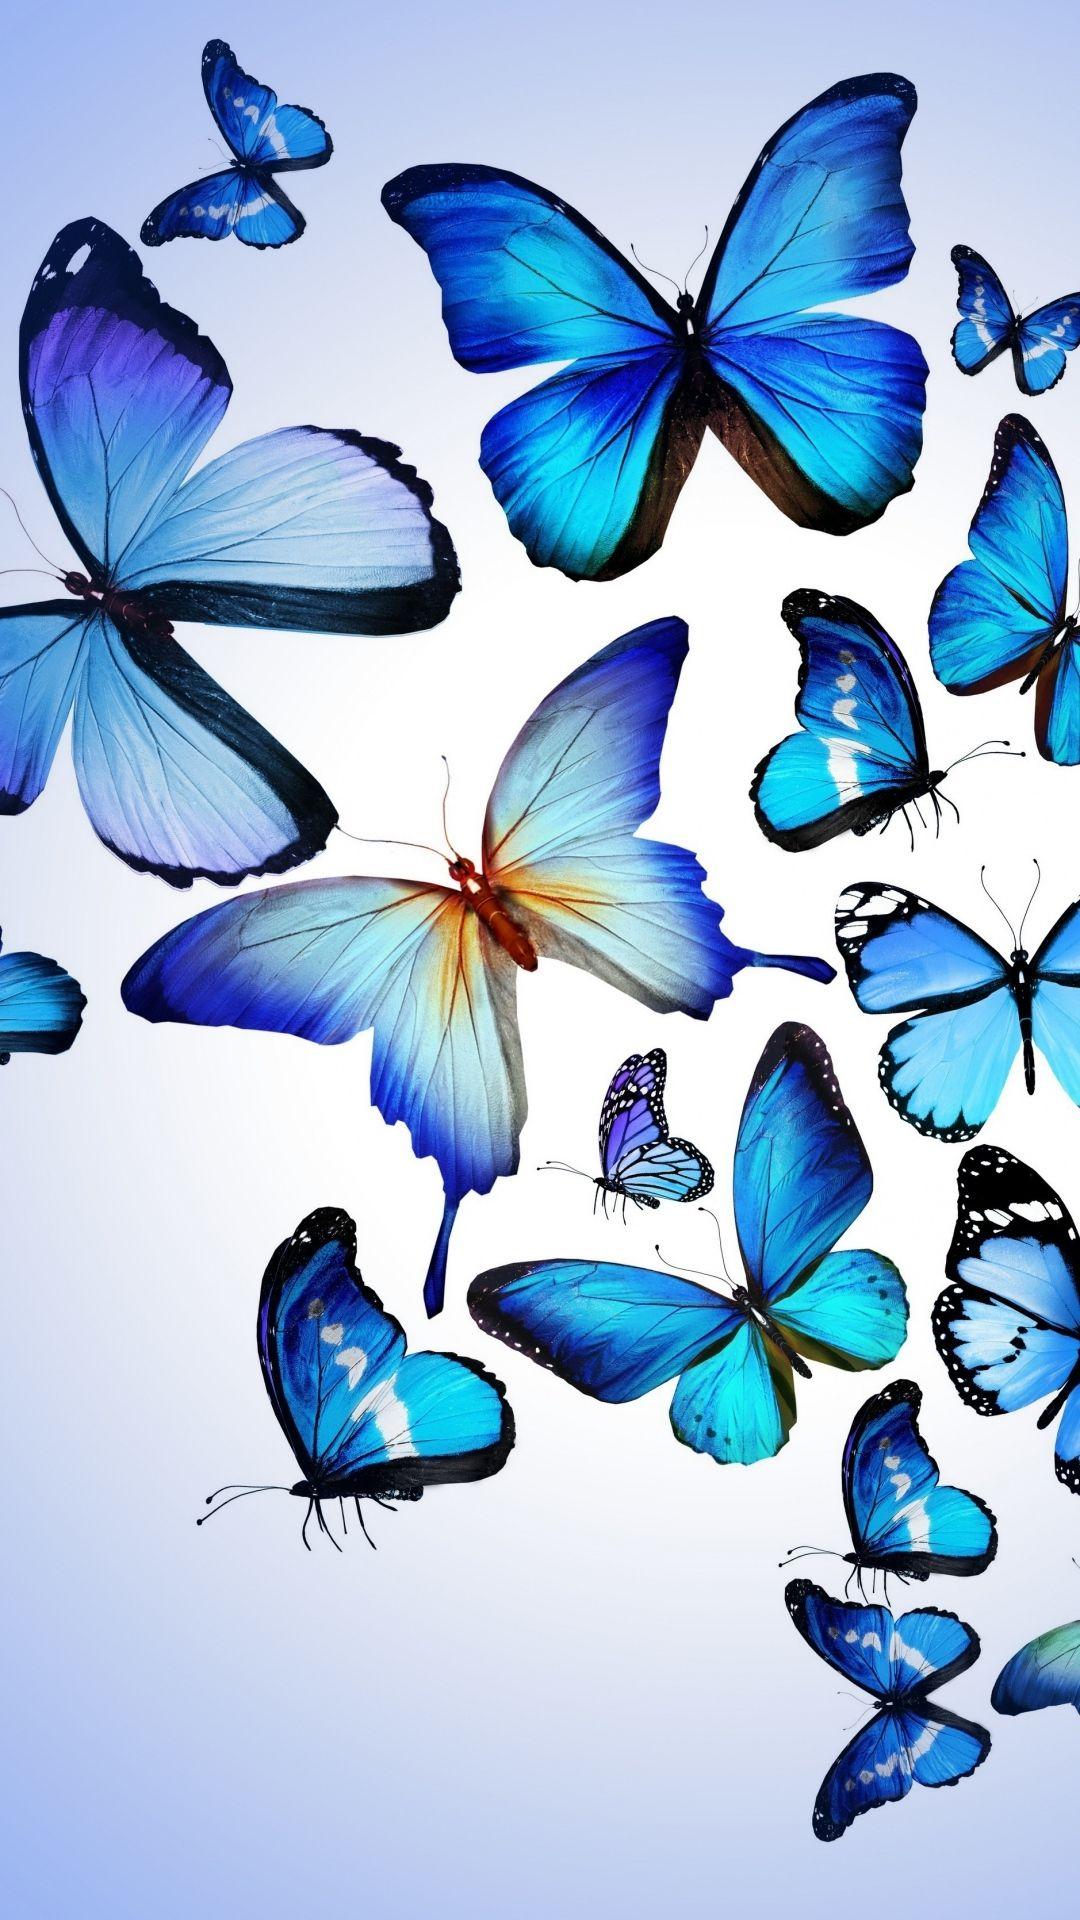 Download Premium Illustration Of Blue Butterflies Patterned On Black Blue Wallpaper Iphone Butterfly Wallpaper Iphone Black Phone Wallpaper